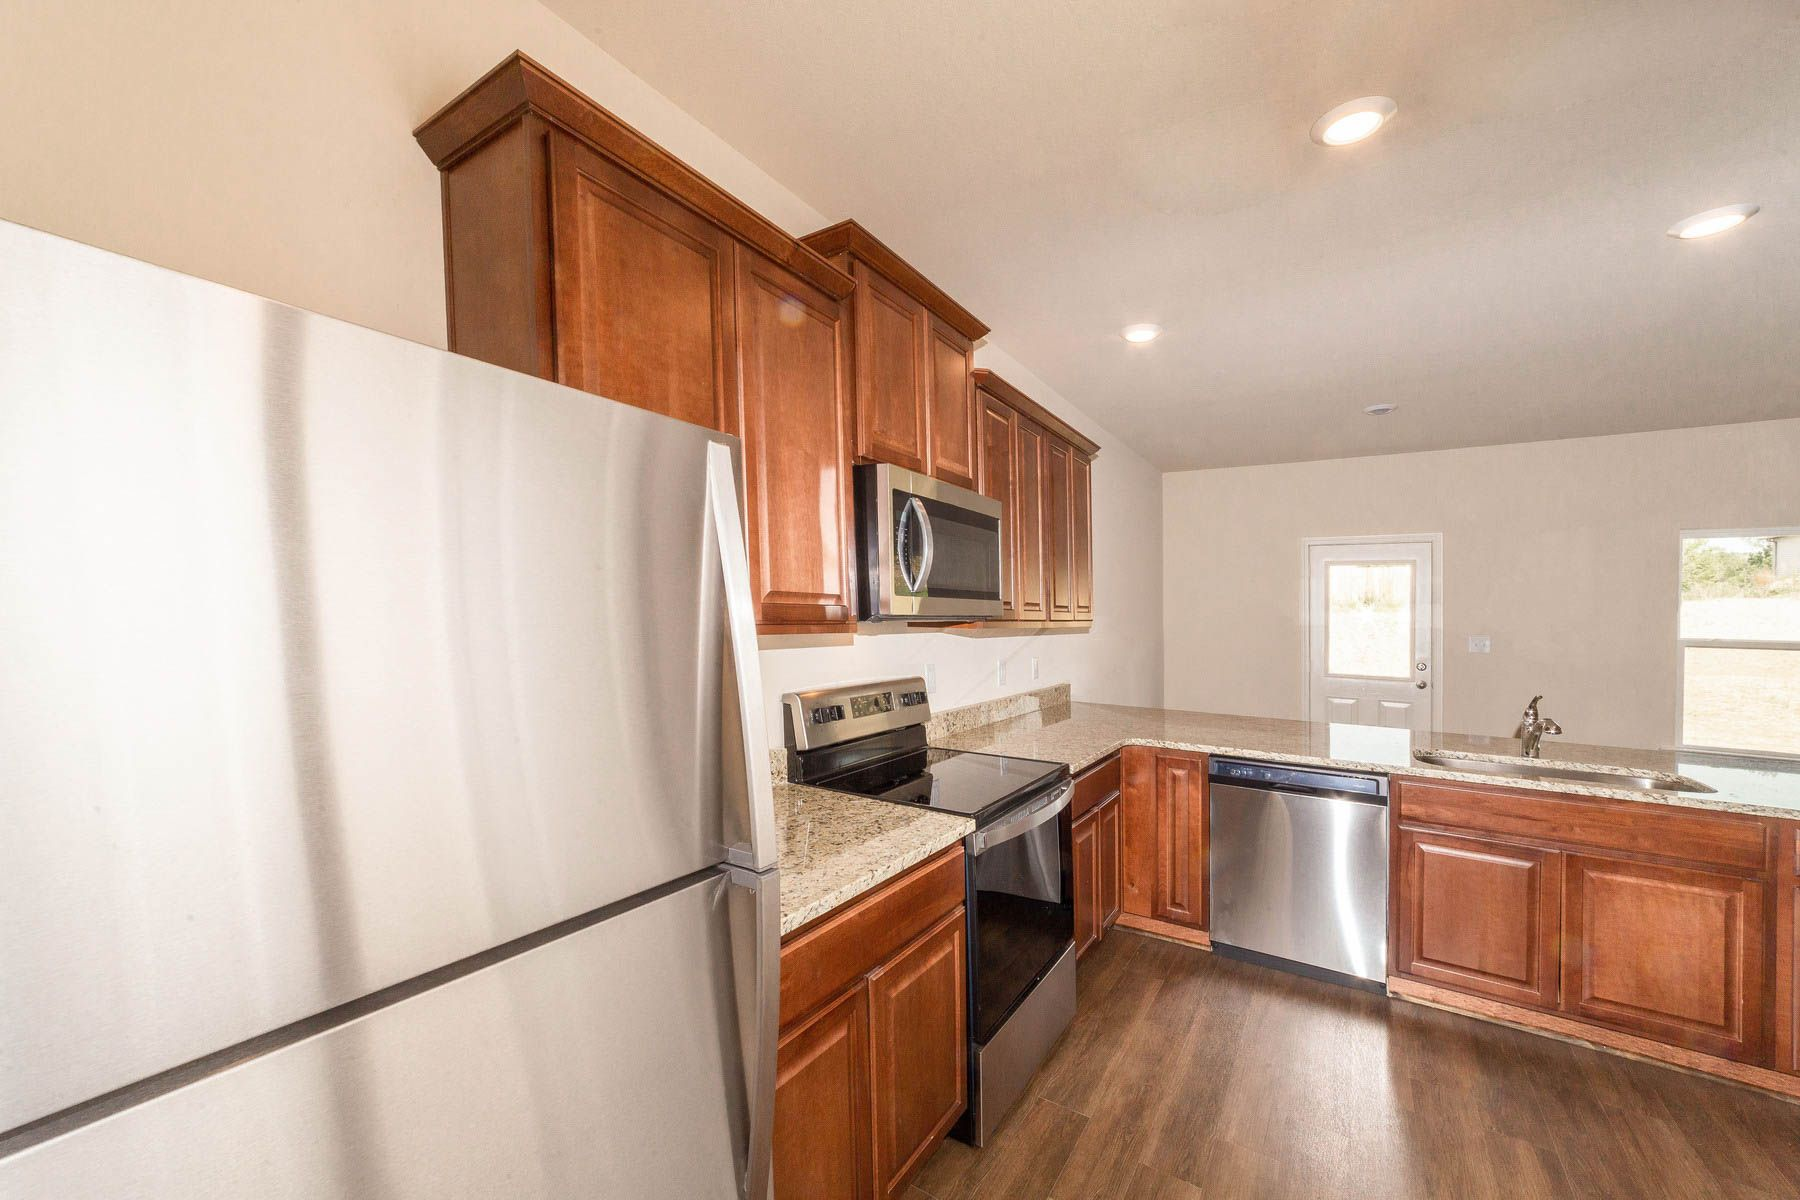 Kitchen featured in the Charleston By LGI Homes in Birmingham, AL